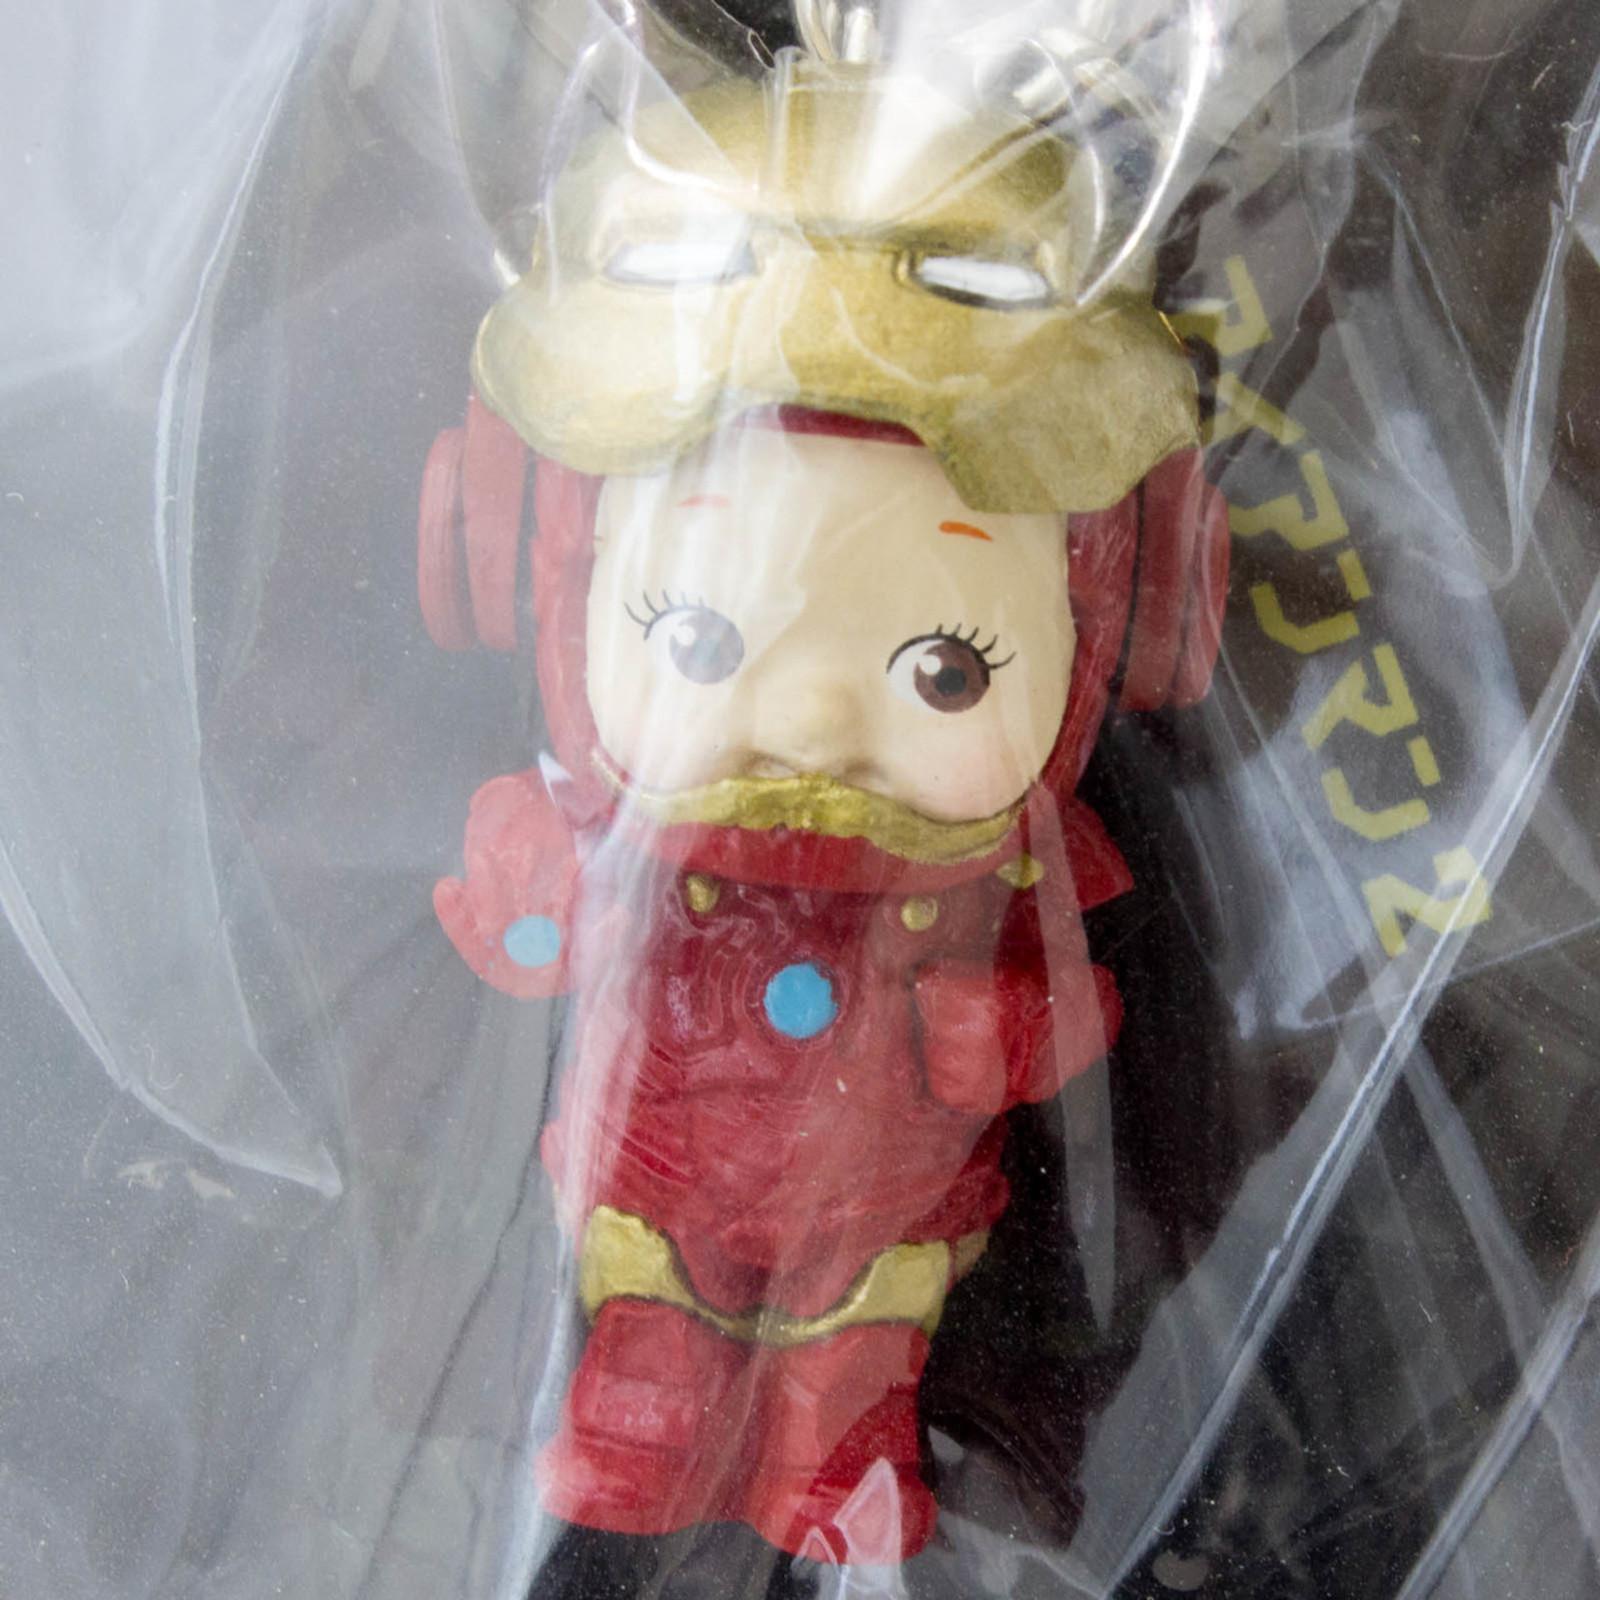 RARE! Iron Man 2 Rose O'neill Kewpie Kewsion Figure Strap Marvel